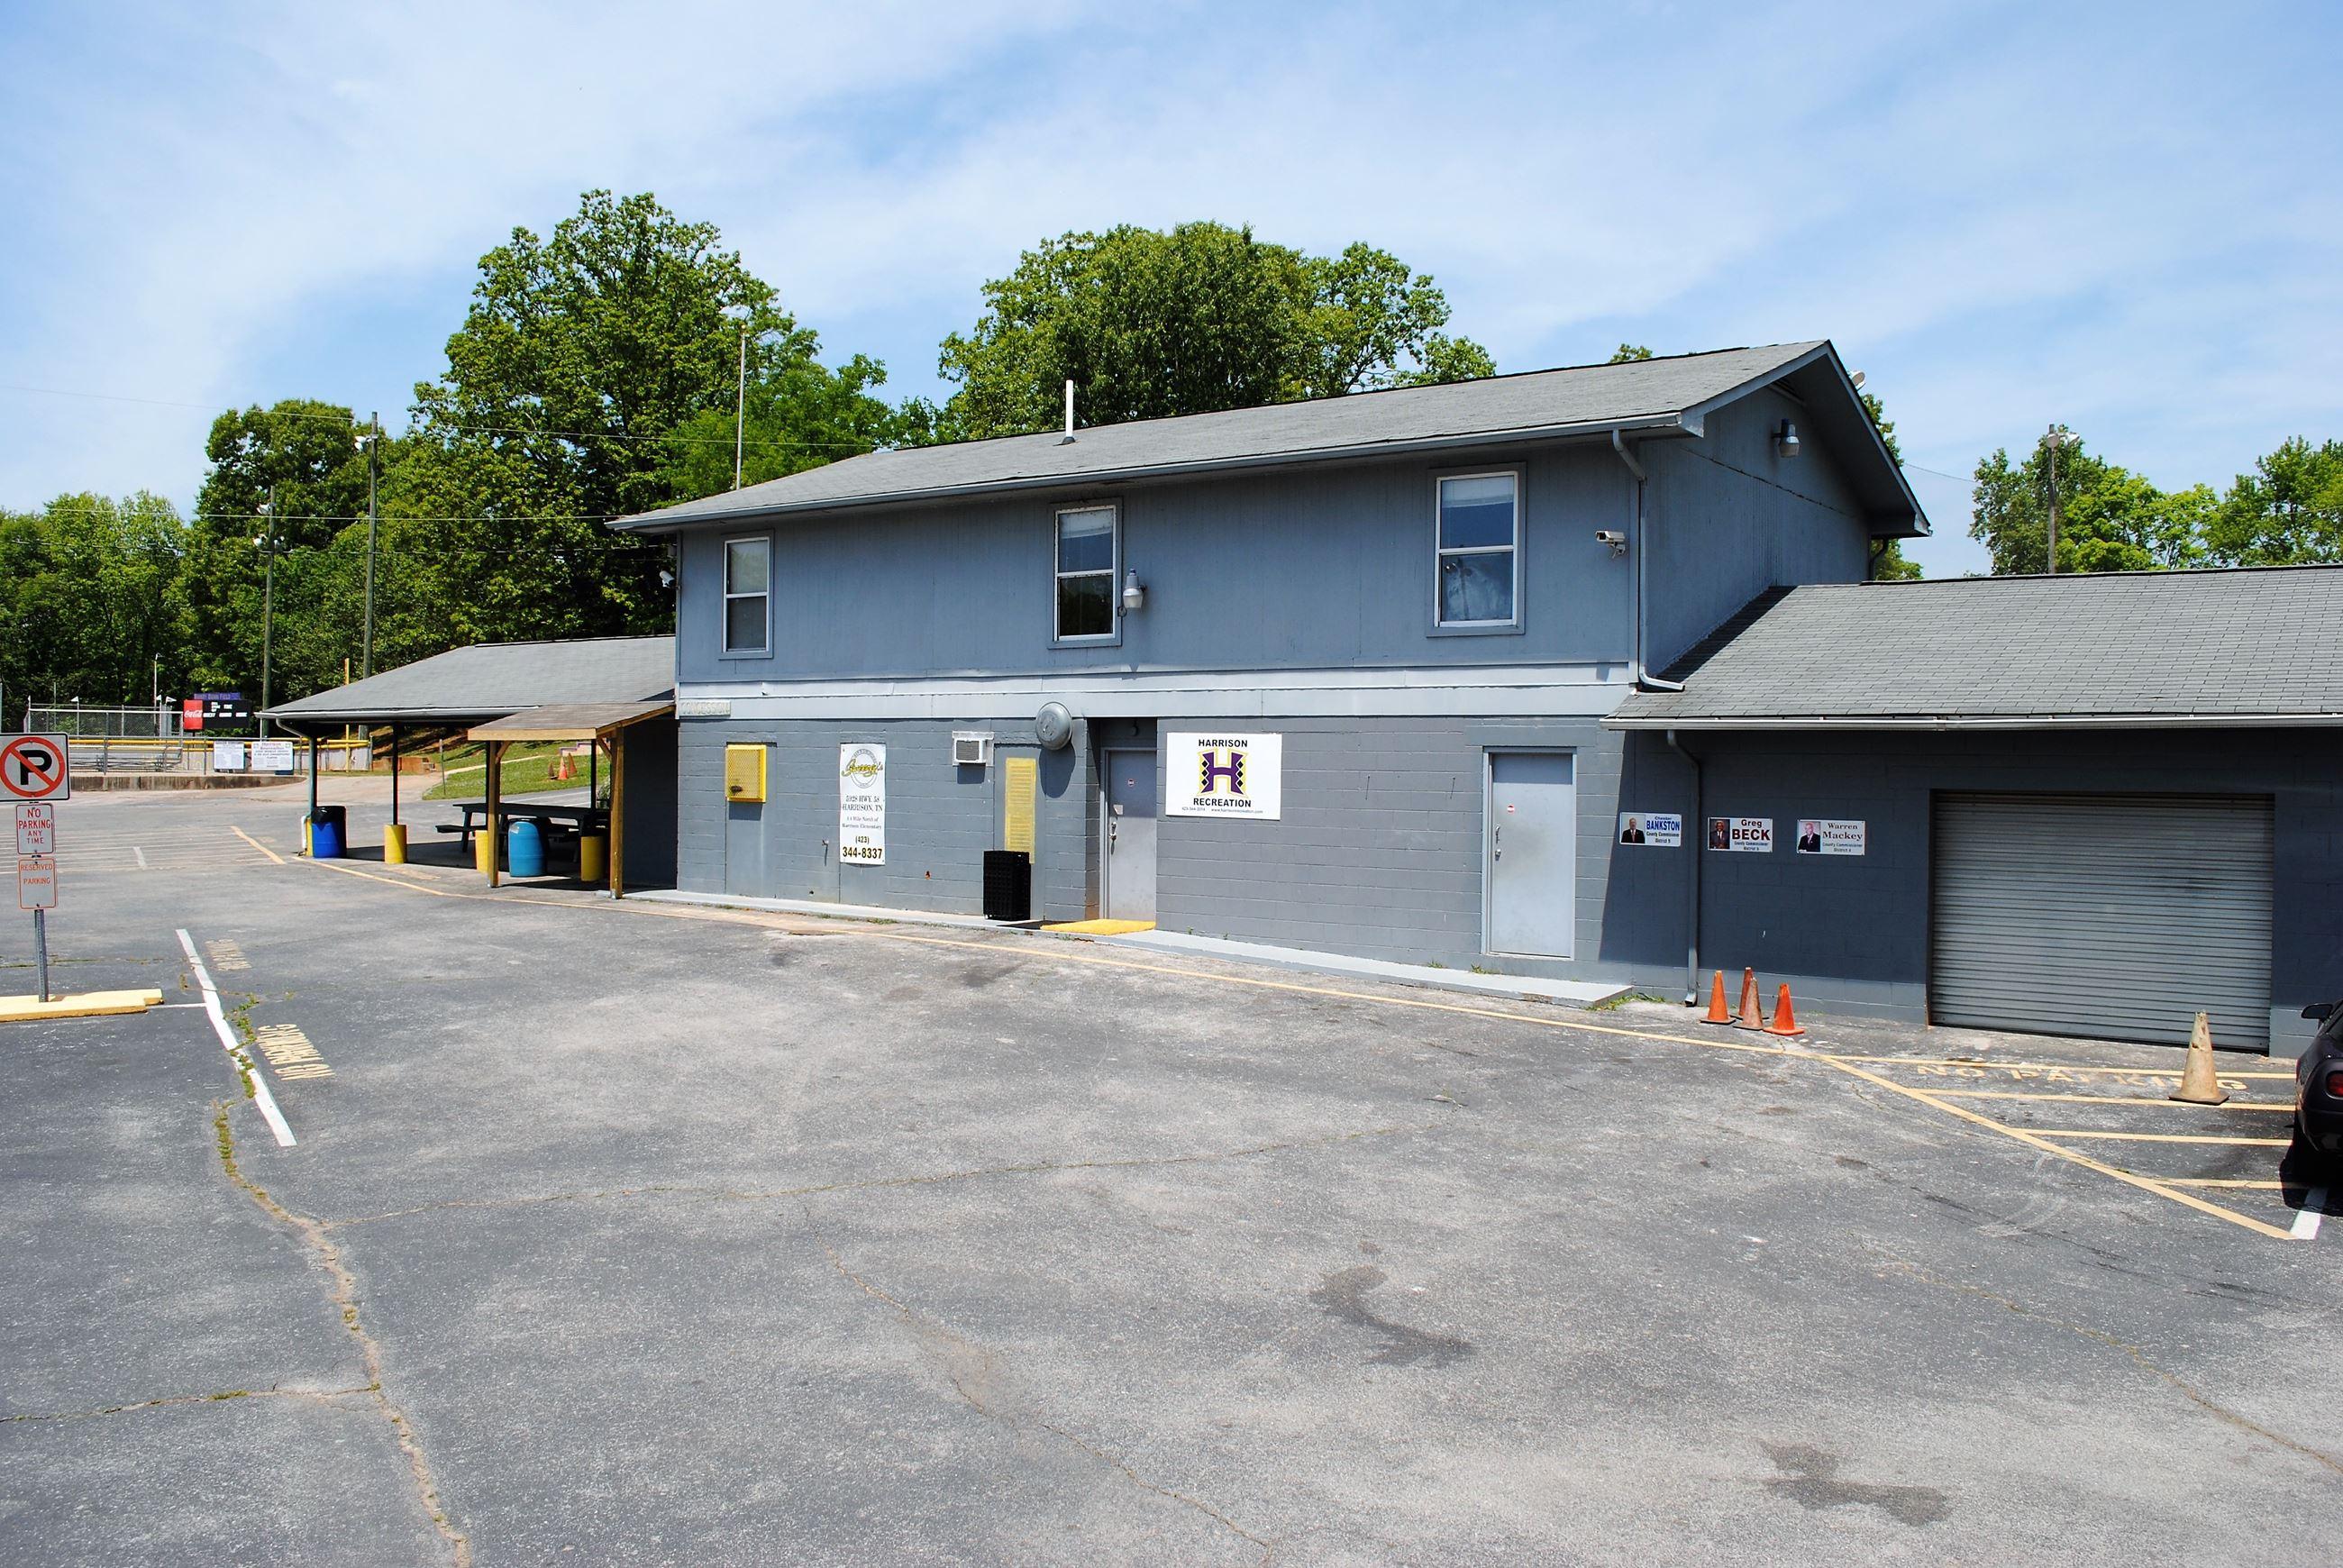 Harrison Recreation | Hamilton County Parks and Recreation, TN